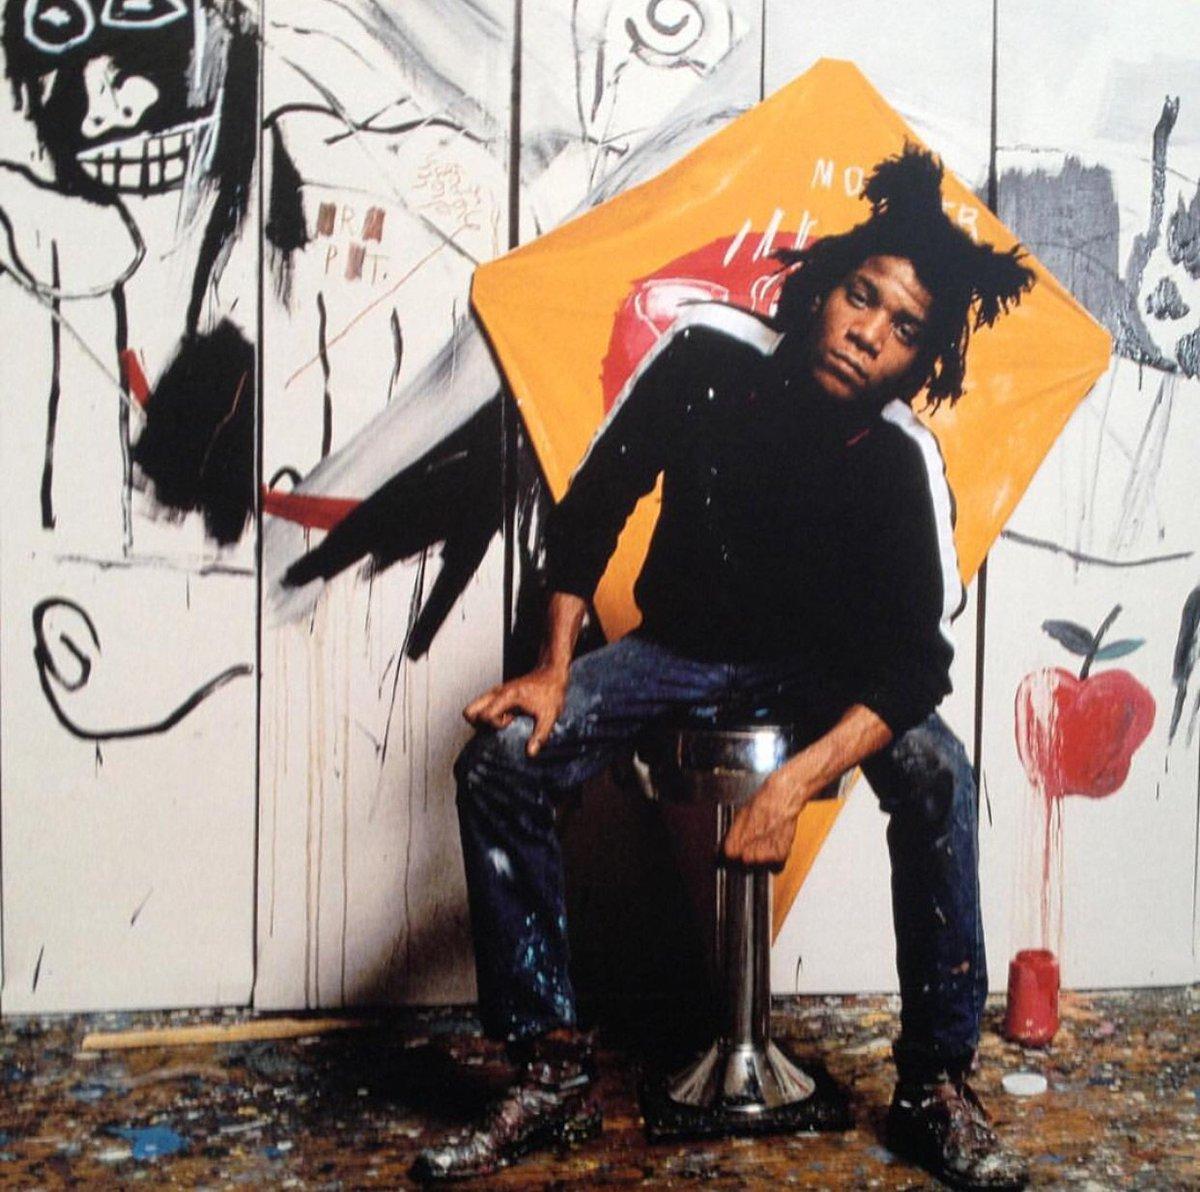 Remembering... #love #legend #basquiat #rip 8/12/88<br>http://pic.twitter.com/txmoenwrTr